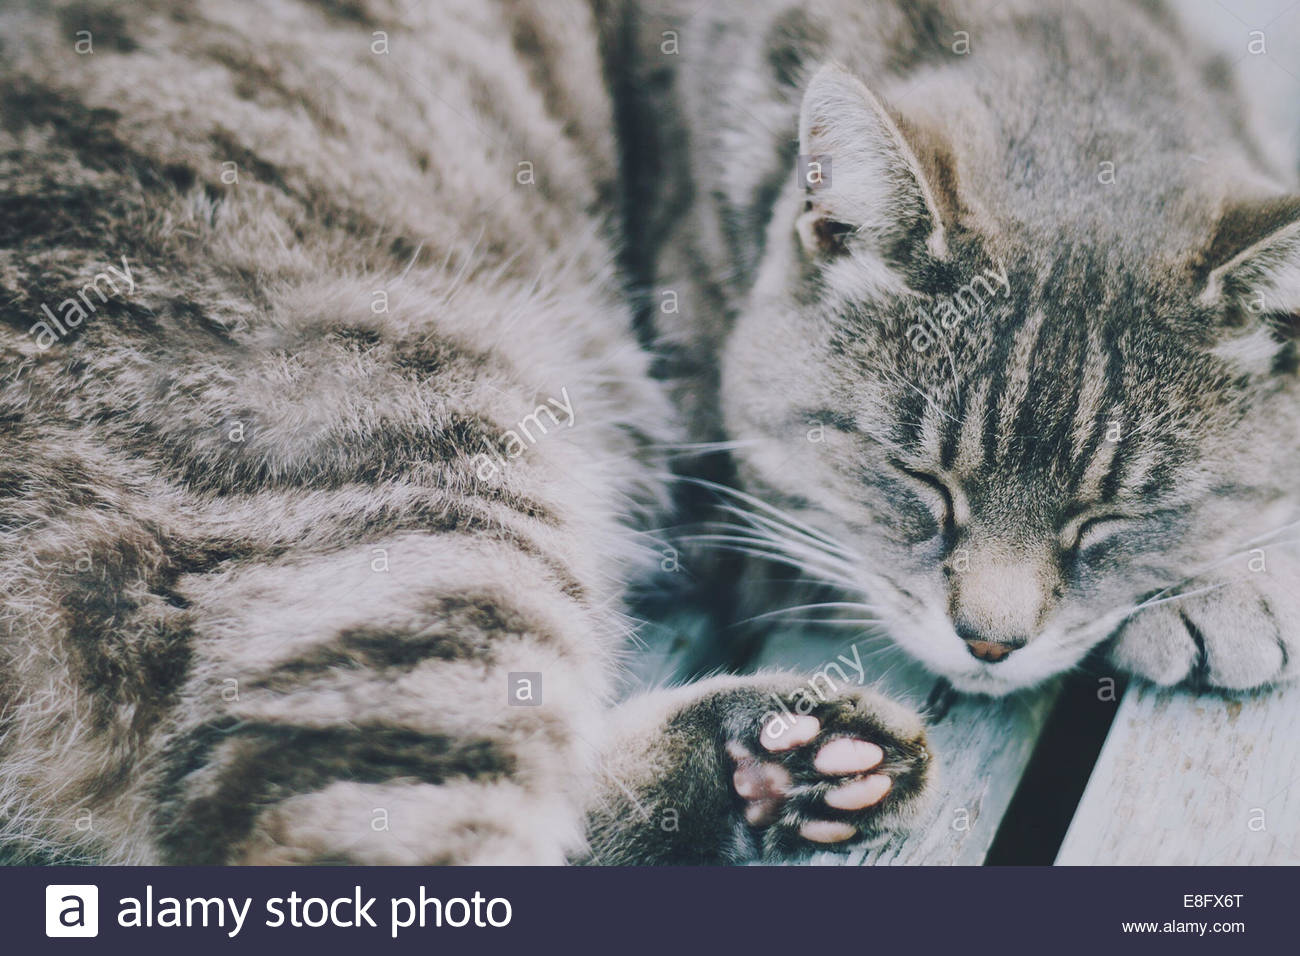 UK, Grey tabby cat sleeping on bench - Stock Image